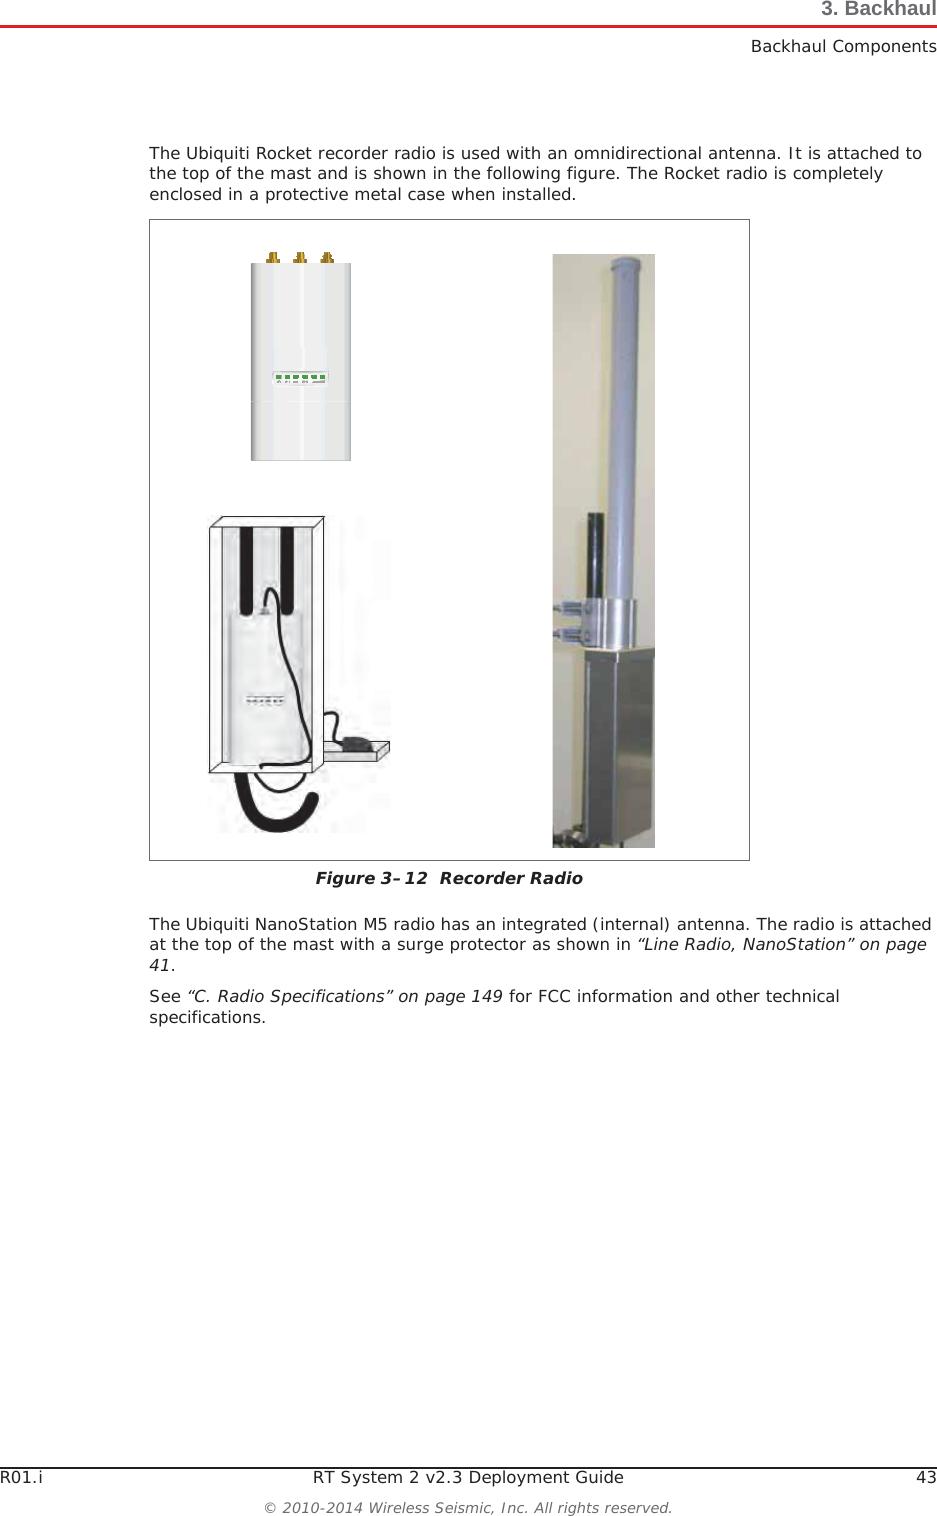 Wireless Seismic 00105 Wireless Remote Unit User Manual